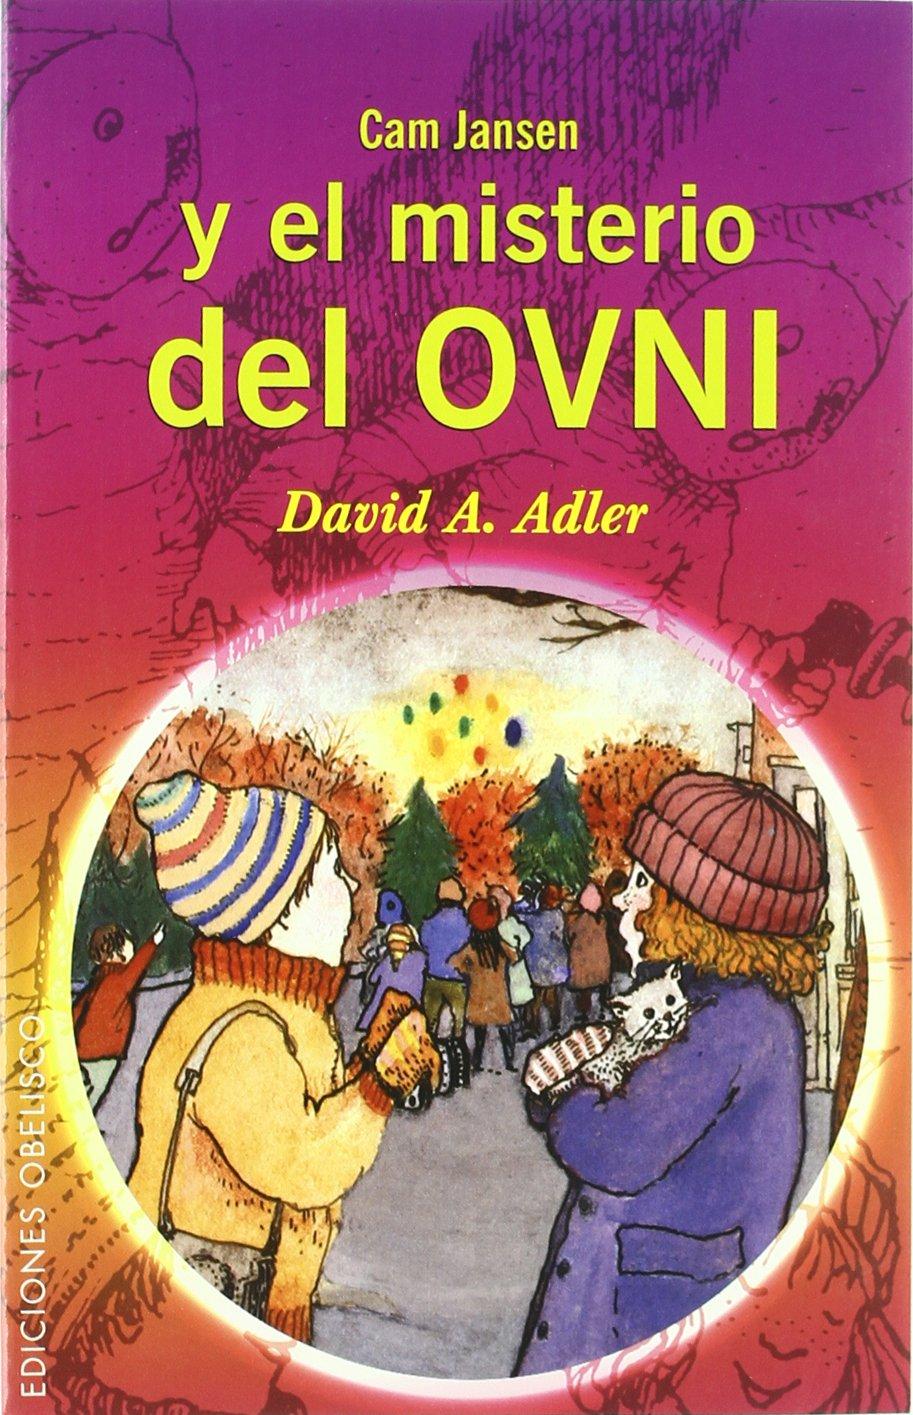 Cam Jansen y el misterio del ovni (Spanish) Paperback